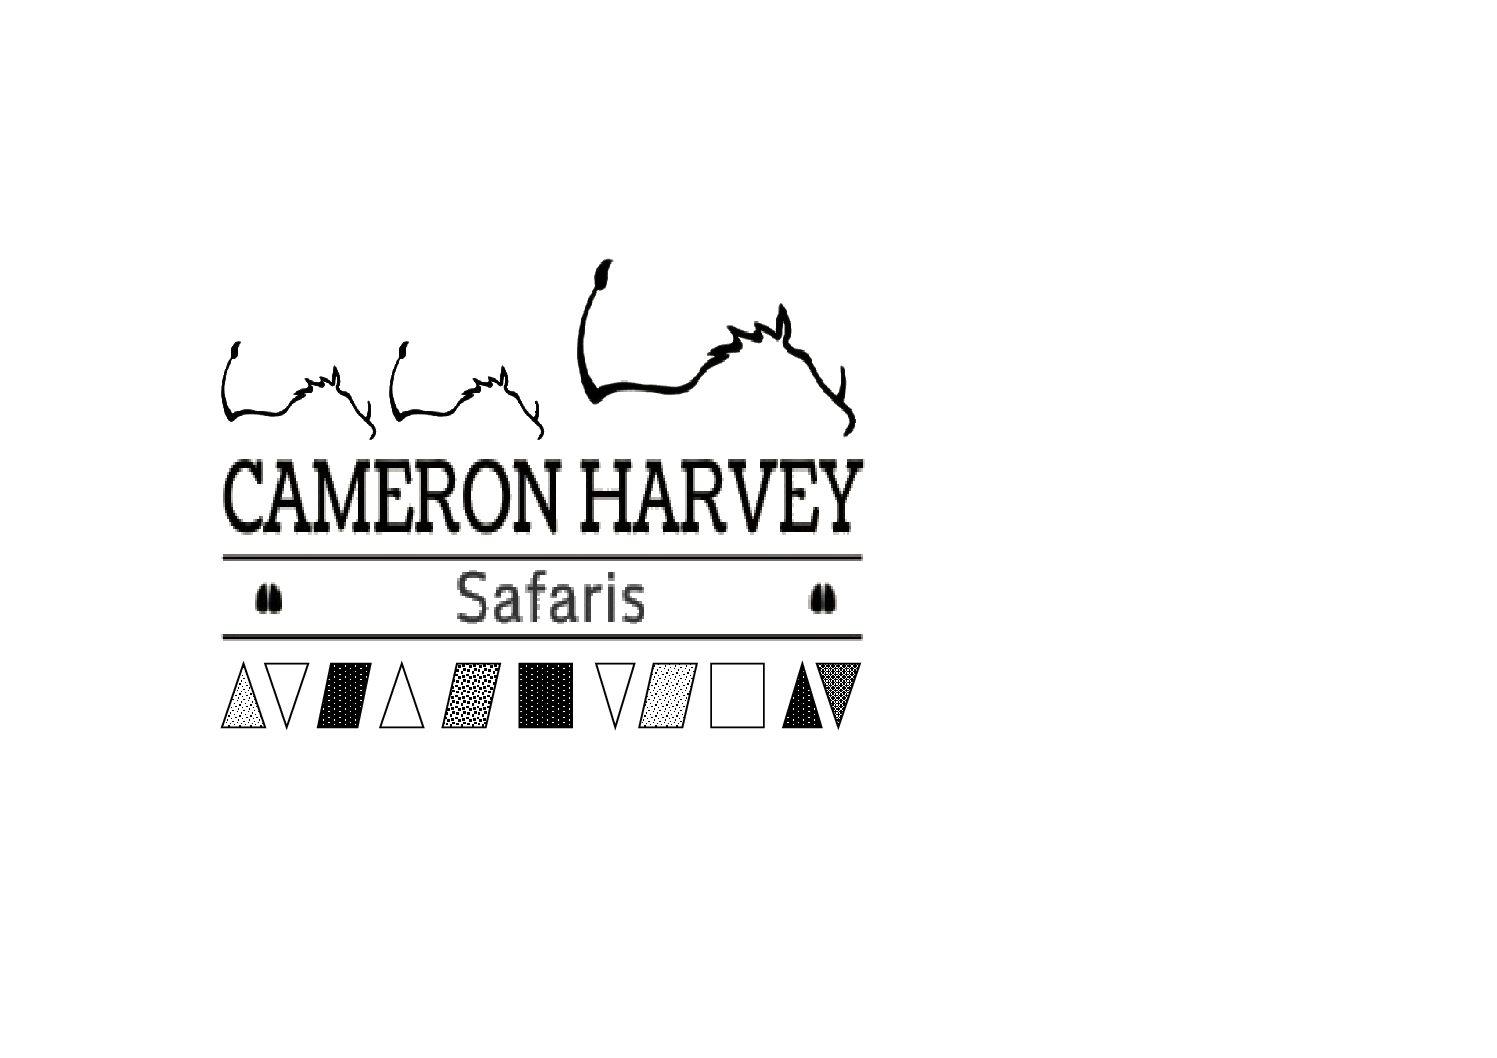 Cameron Harvey Safaris